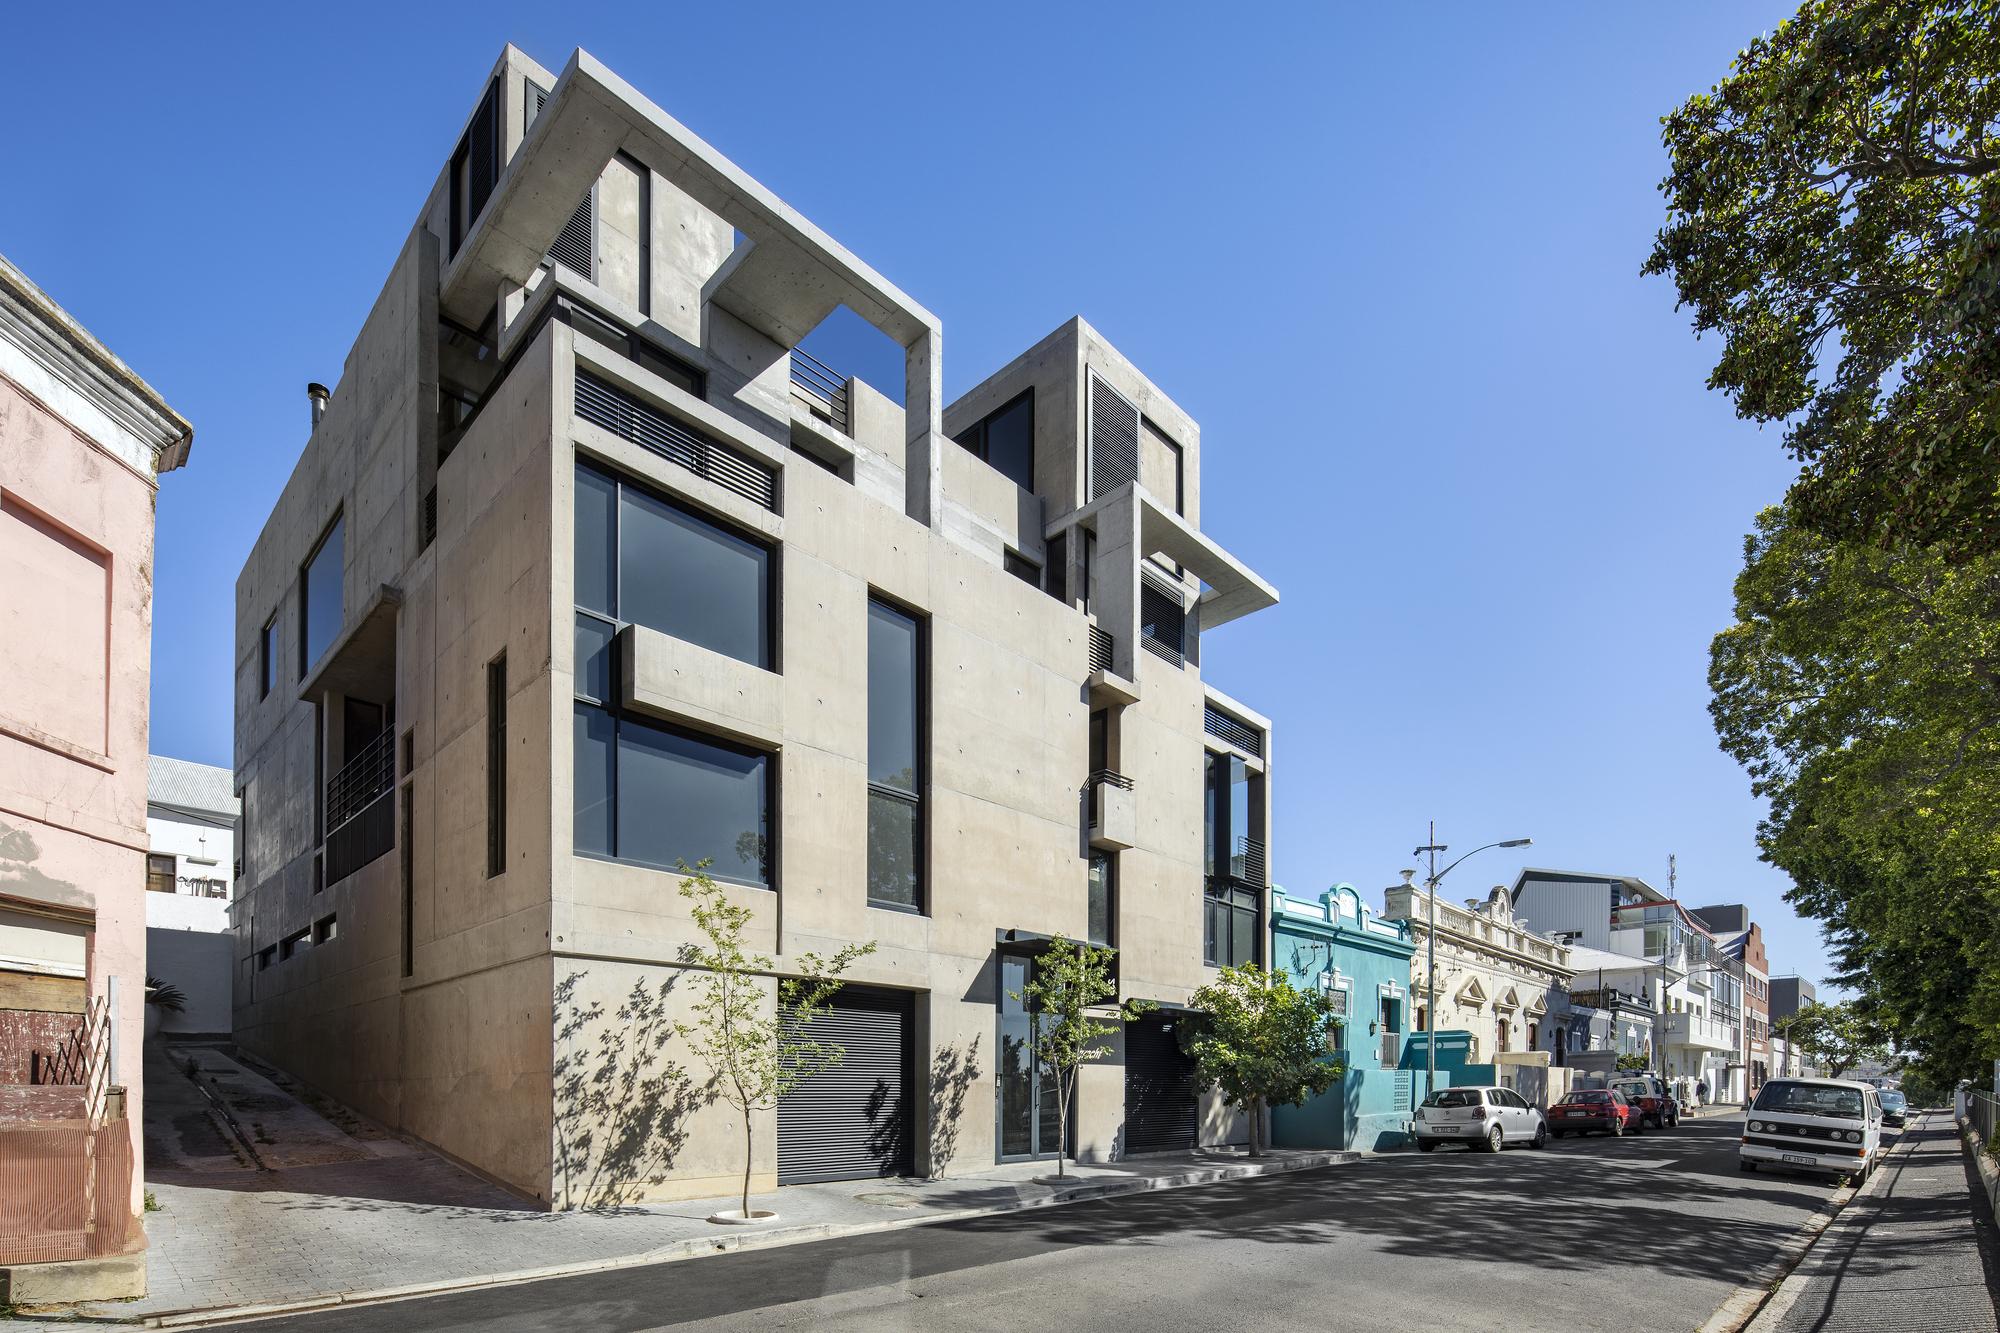 236 Buitengracht Street / Team Architects